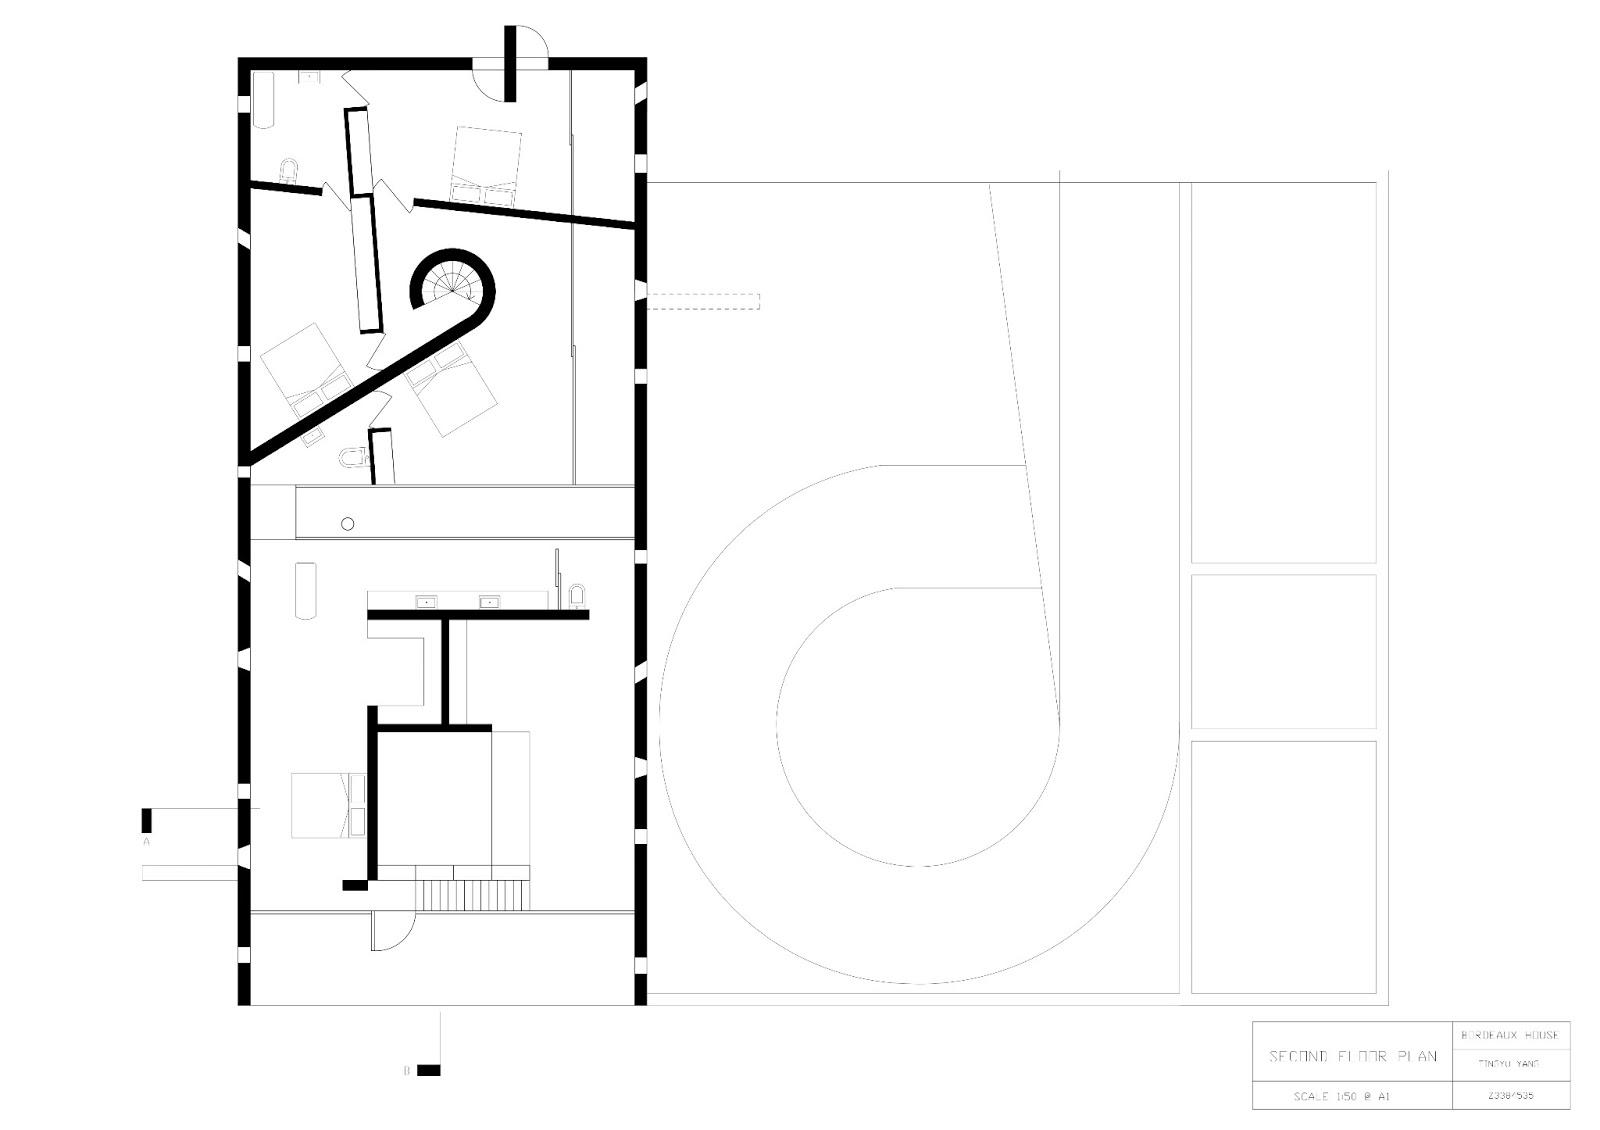 arch1201 design studio three carol bordeaux house drawings. Black Bedroom Furniture Sets. Home Design Ideas